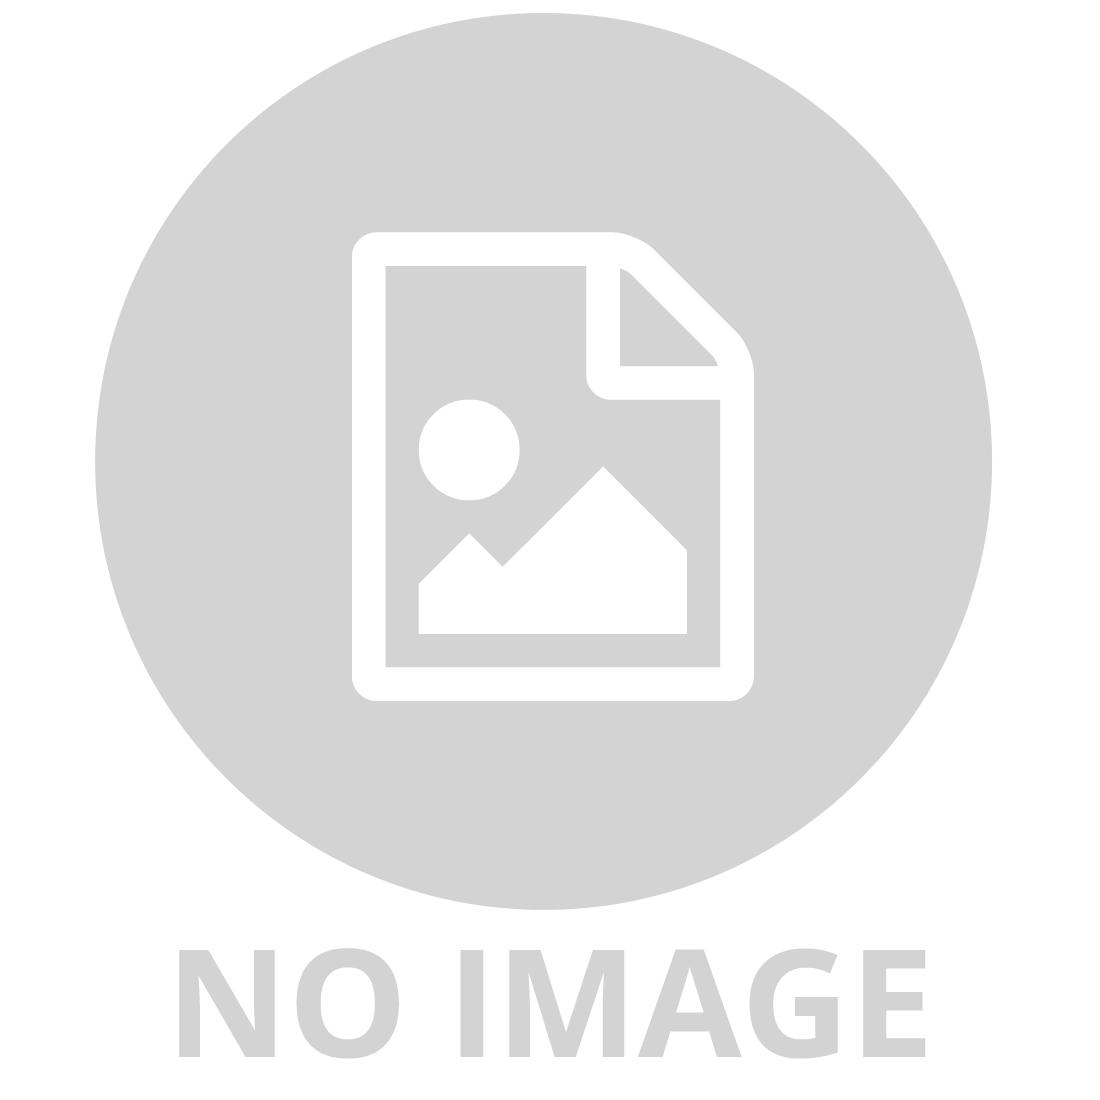 LEGO MARVEL 76130 SPIDER-MAN STARK JET & THE DRONE ATTACK